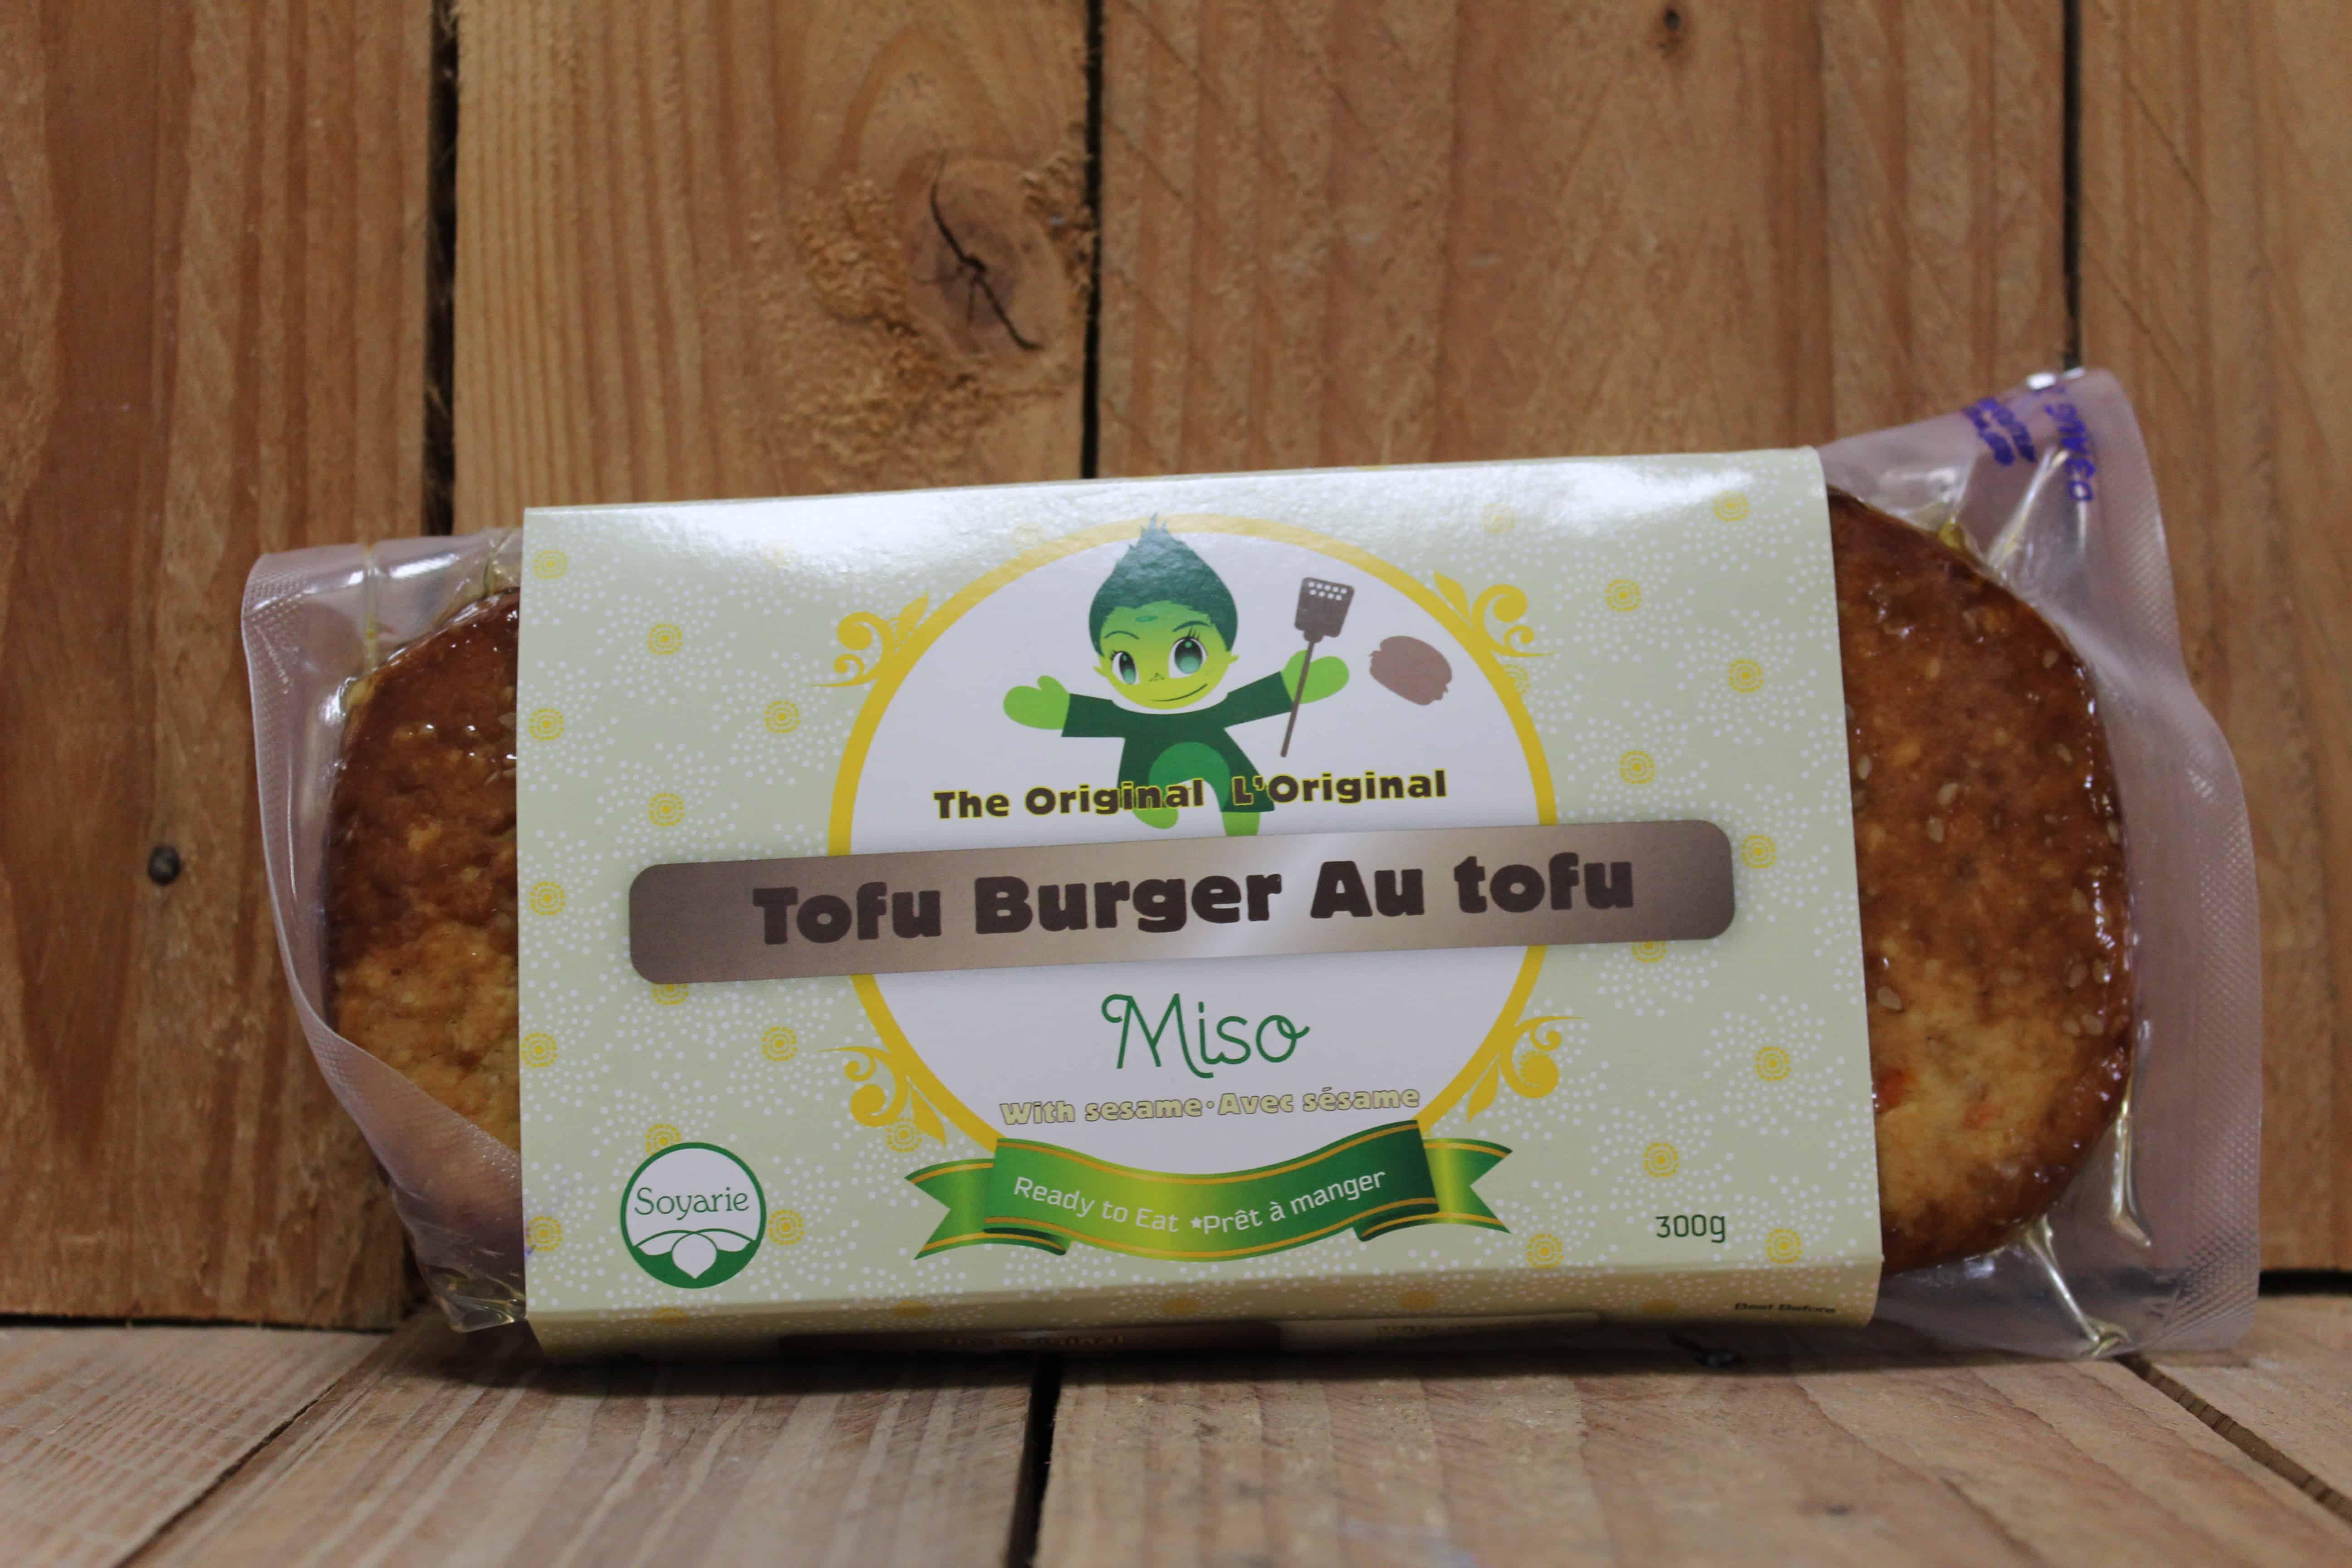 La Soyarie – Miso Tofu Burger (300g)